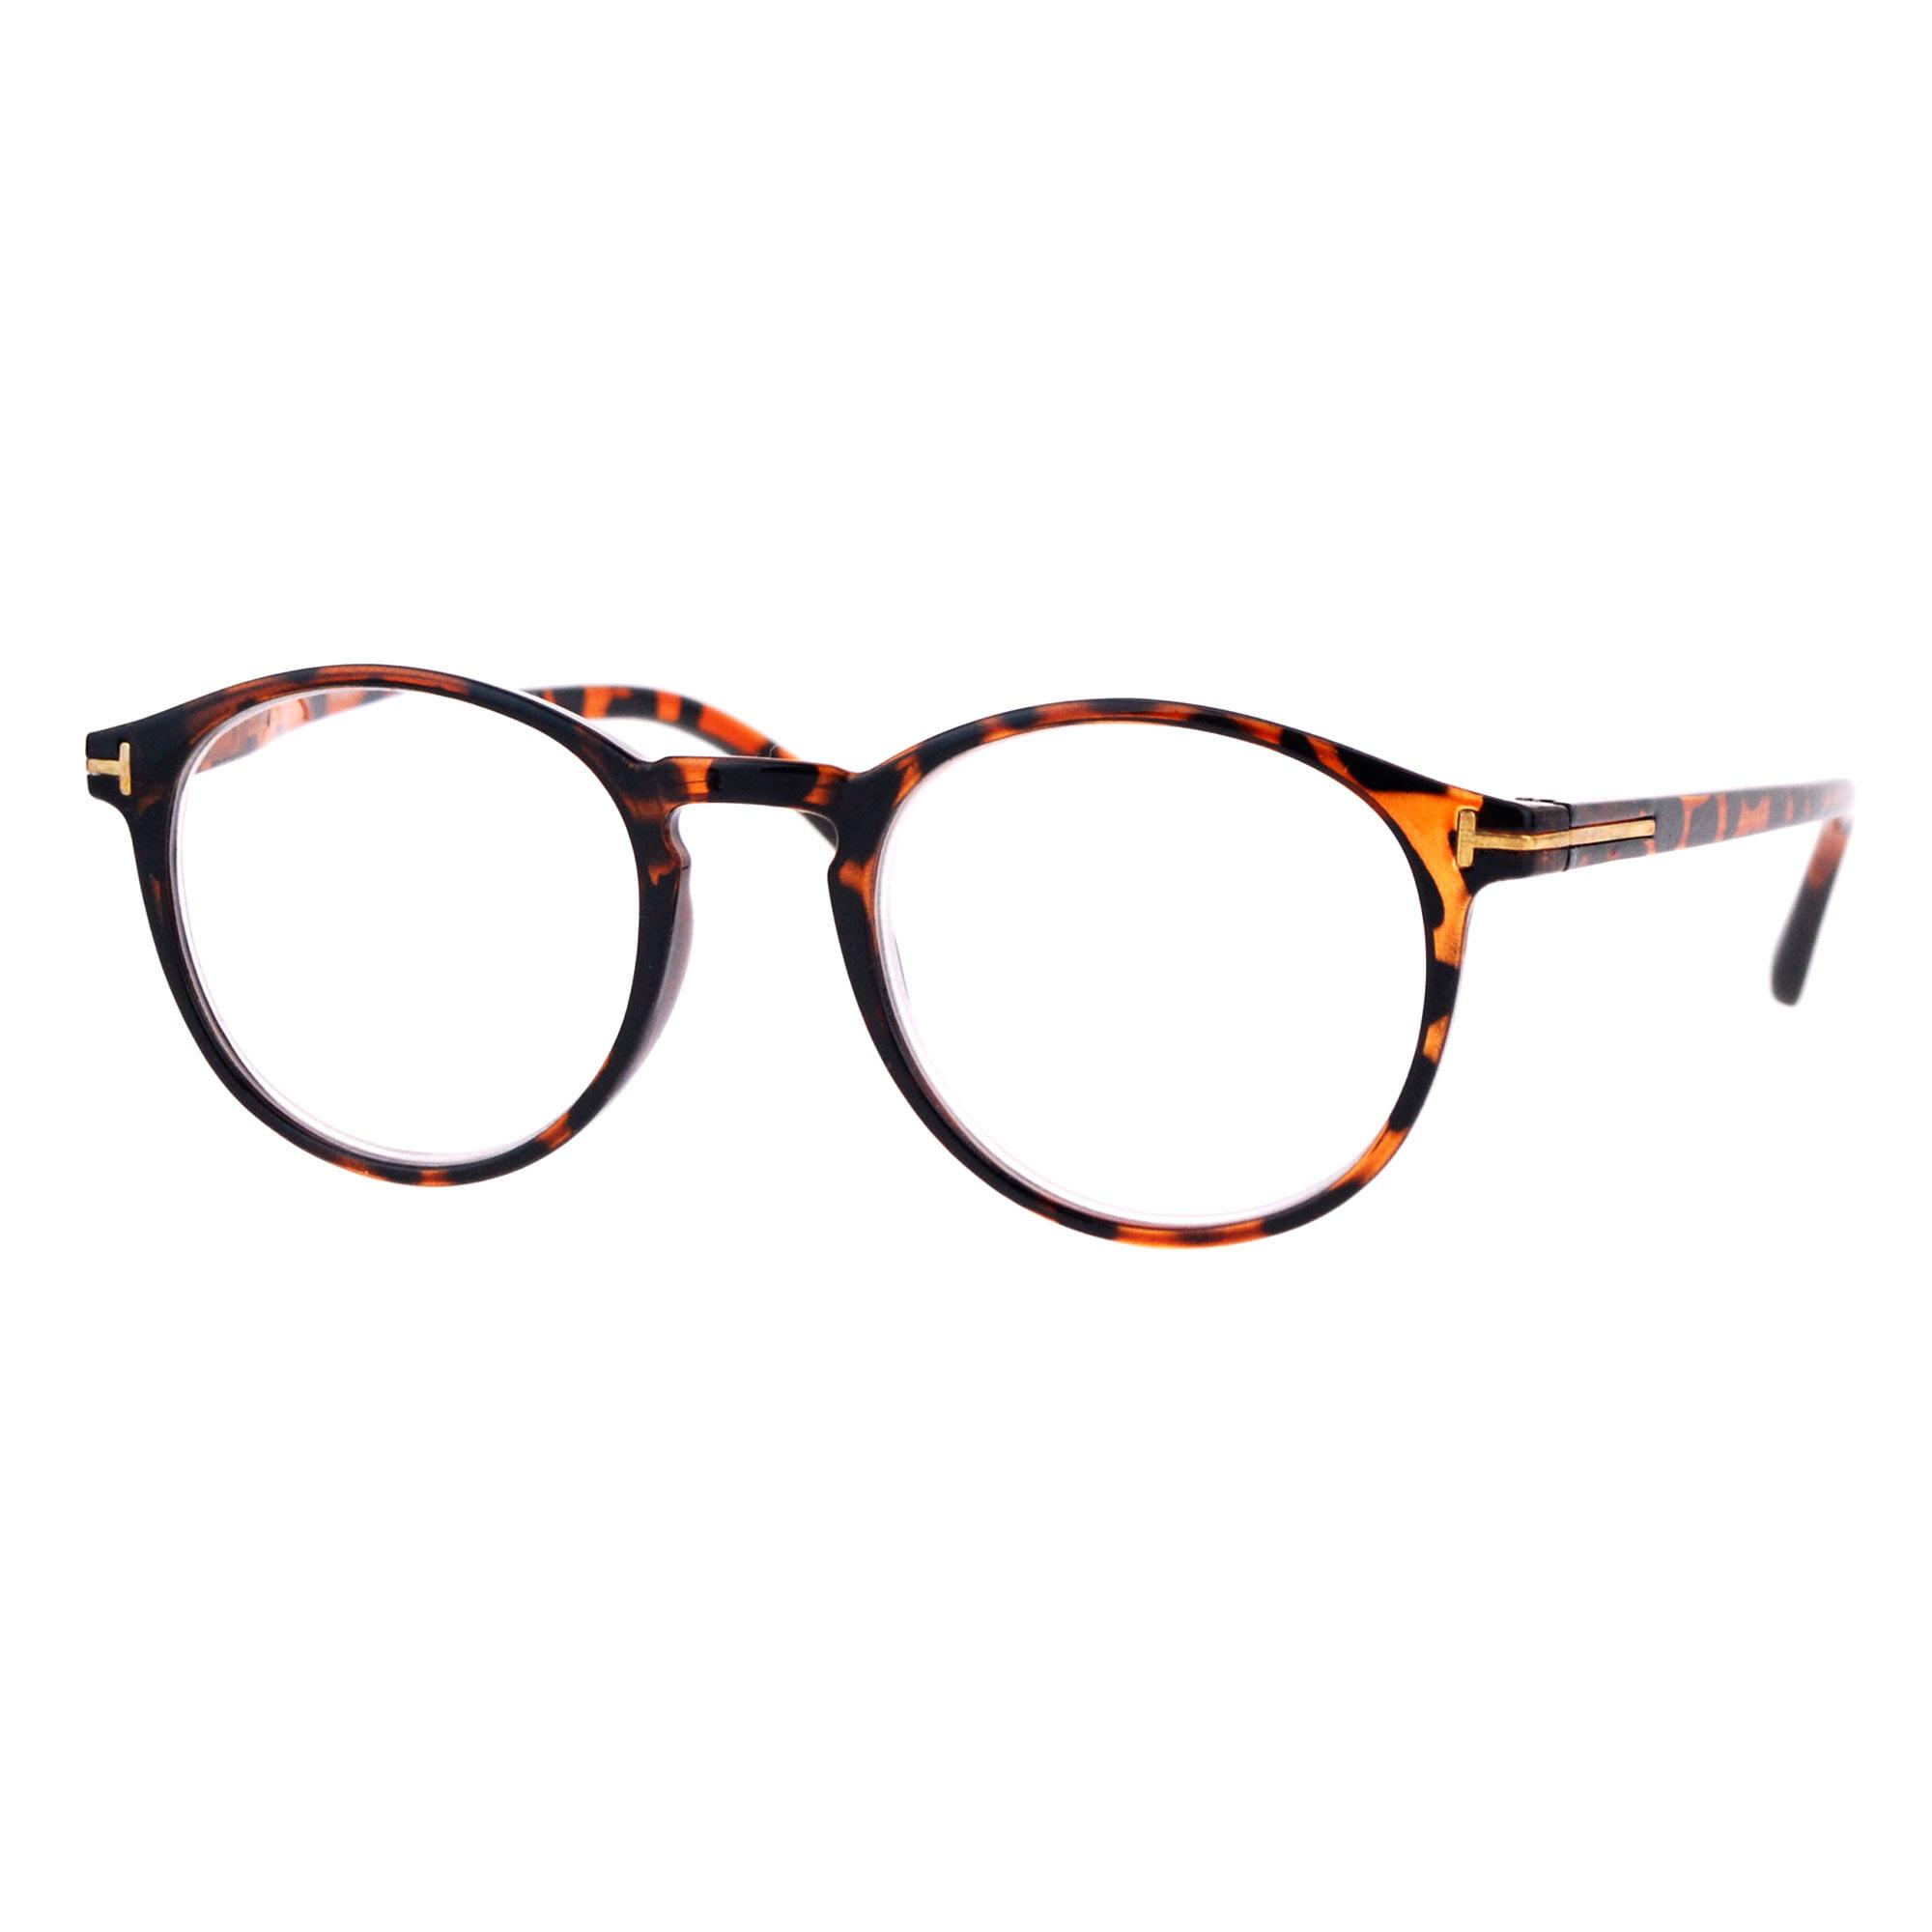 d90e5920bc44 Retro Round Keyhole Thin Horn Rim Plastic Reading Glasses Tortoise +1.0 -  Walmart.com